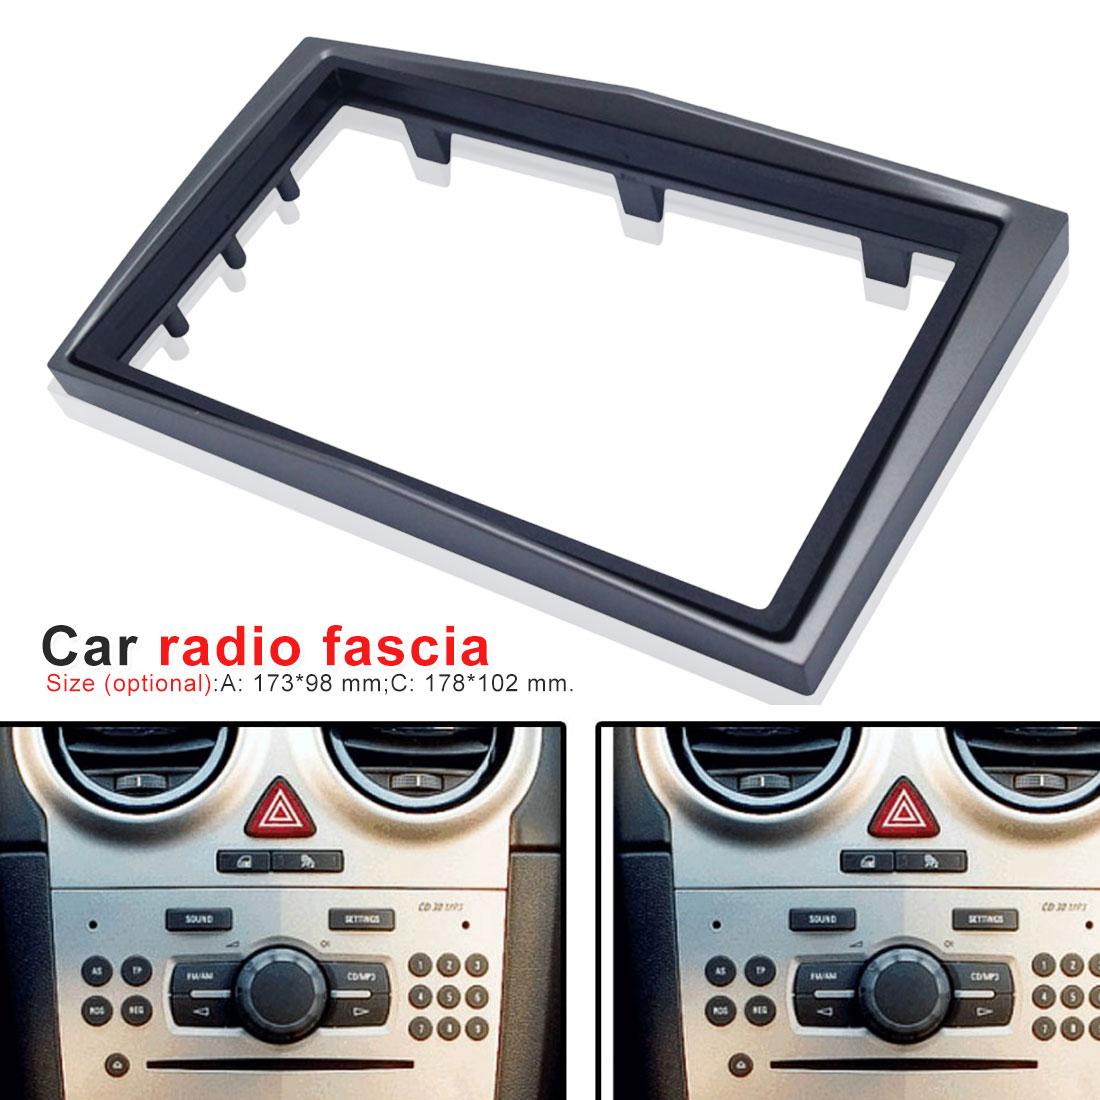 Vauxhall Corsa D Zafira Astra Fascia//Facia Panel Adapter Double DIN Surround